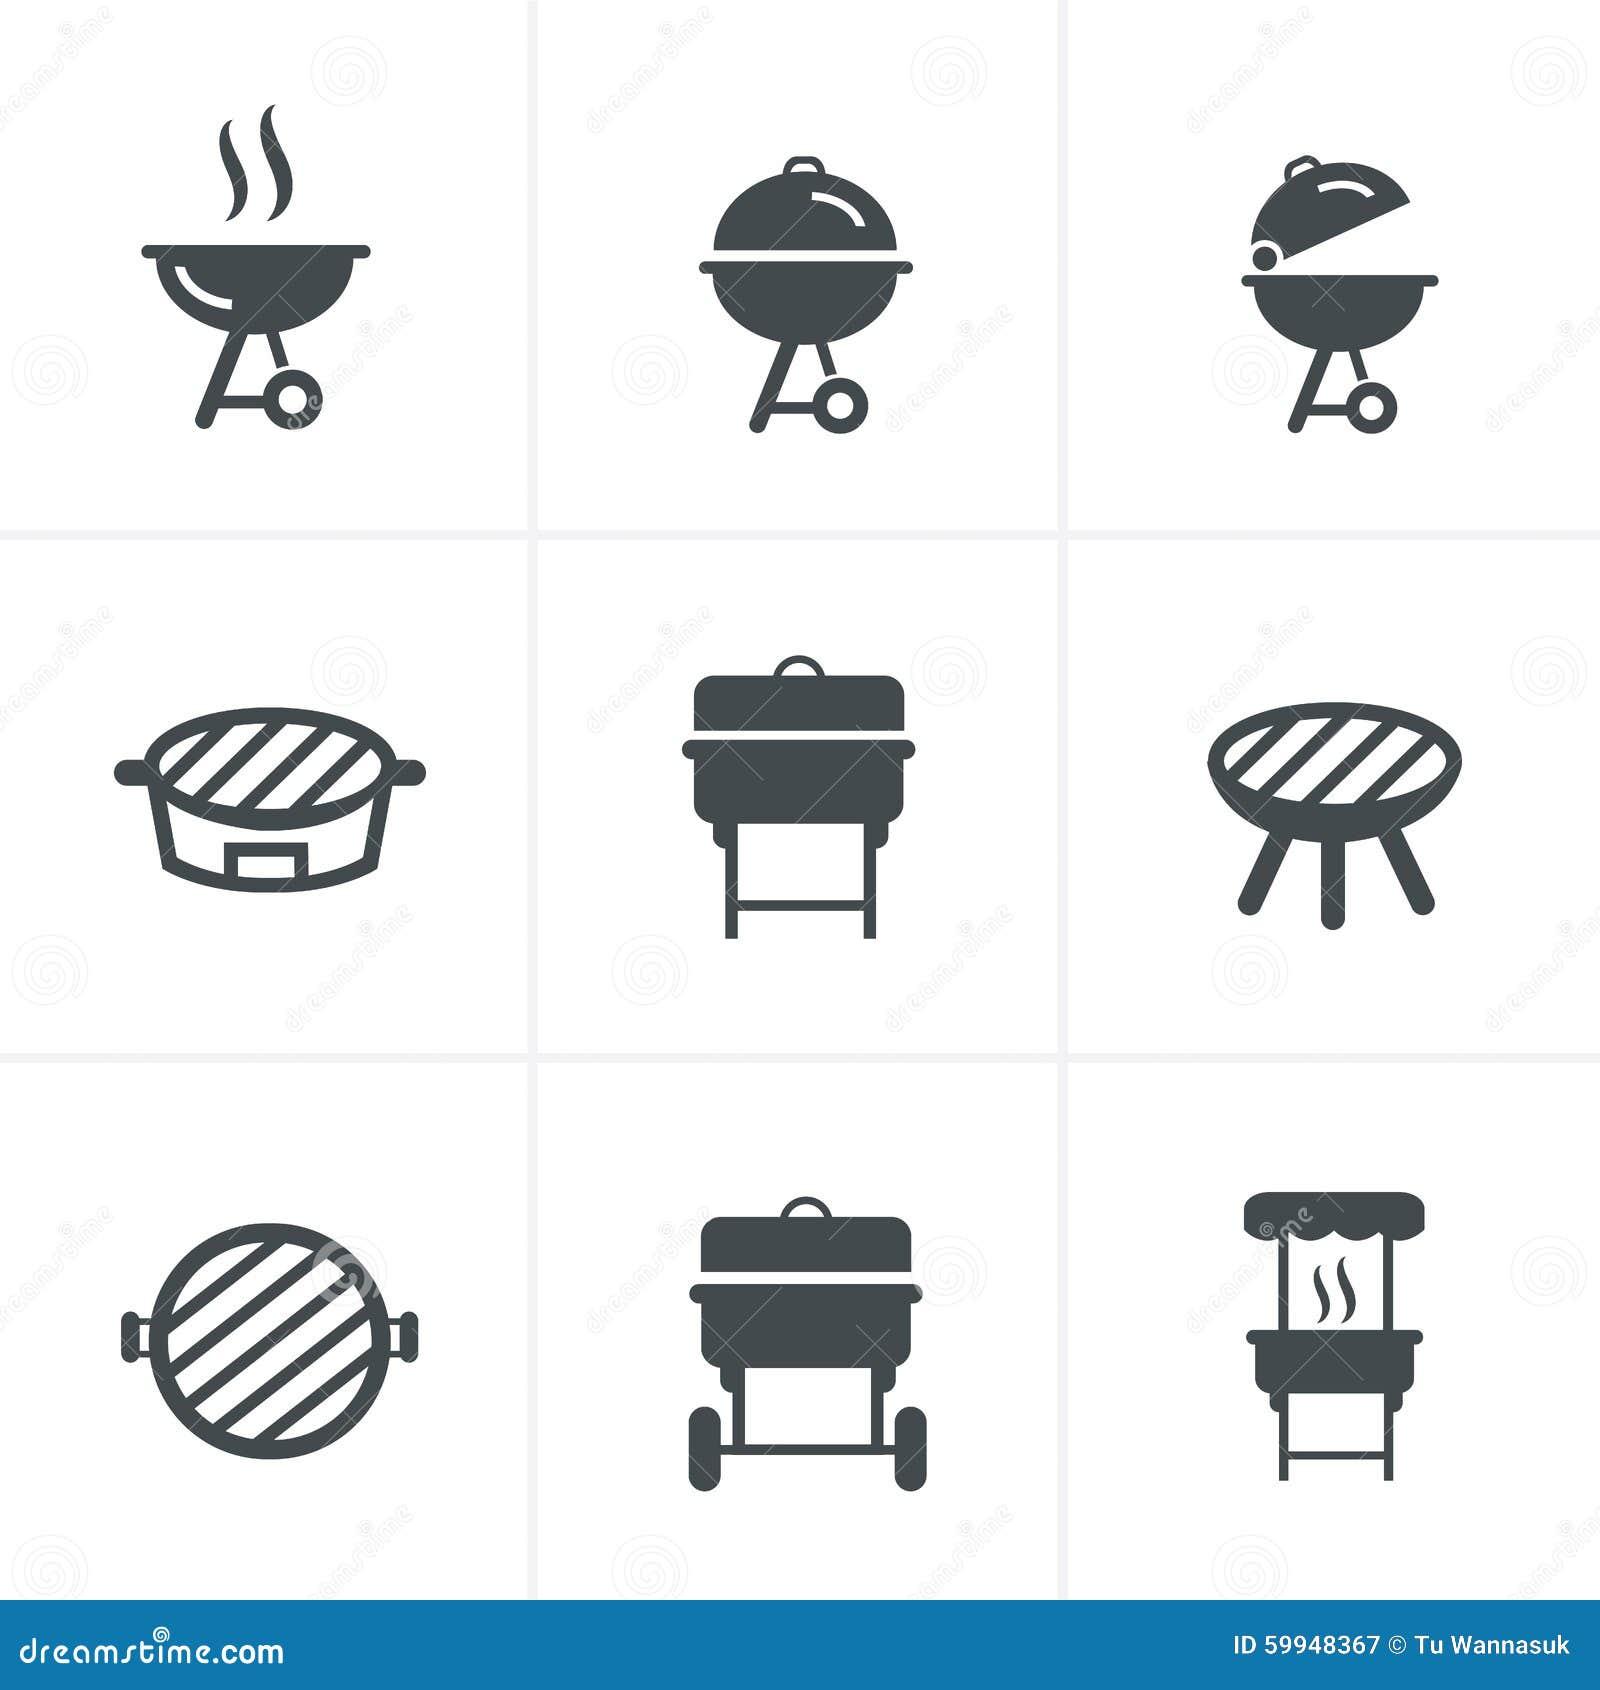 the grill icon barbeque symbol stock illustration illustration 59948367. Black Bedroom Furniture Sets. Home Design Ideas